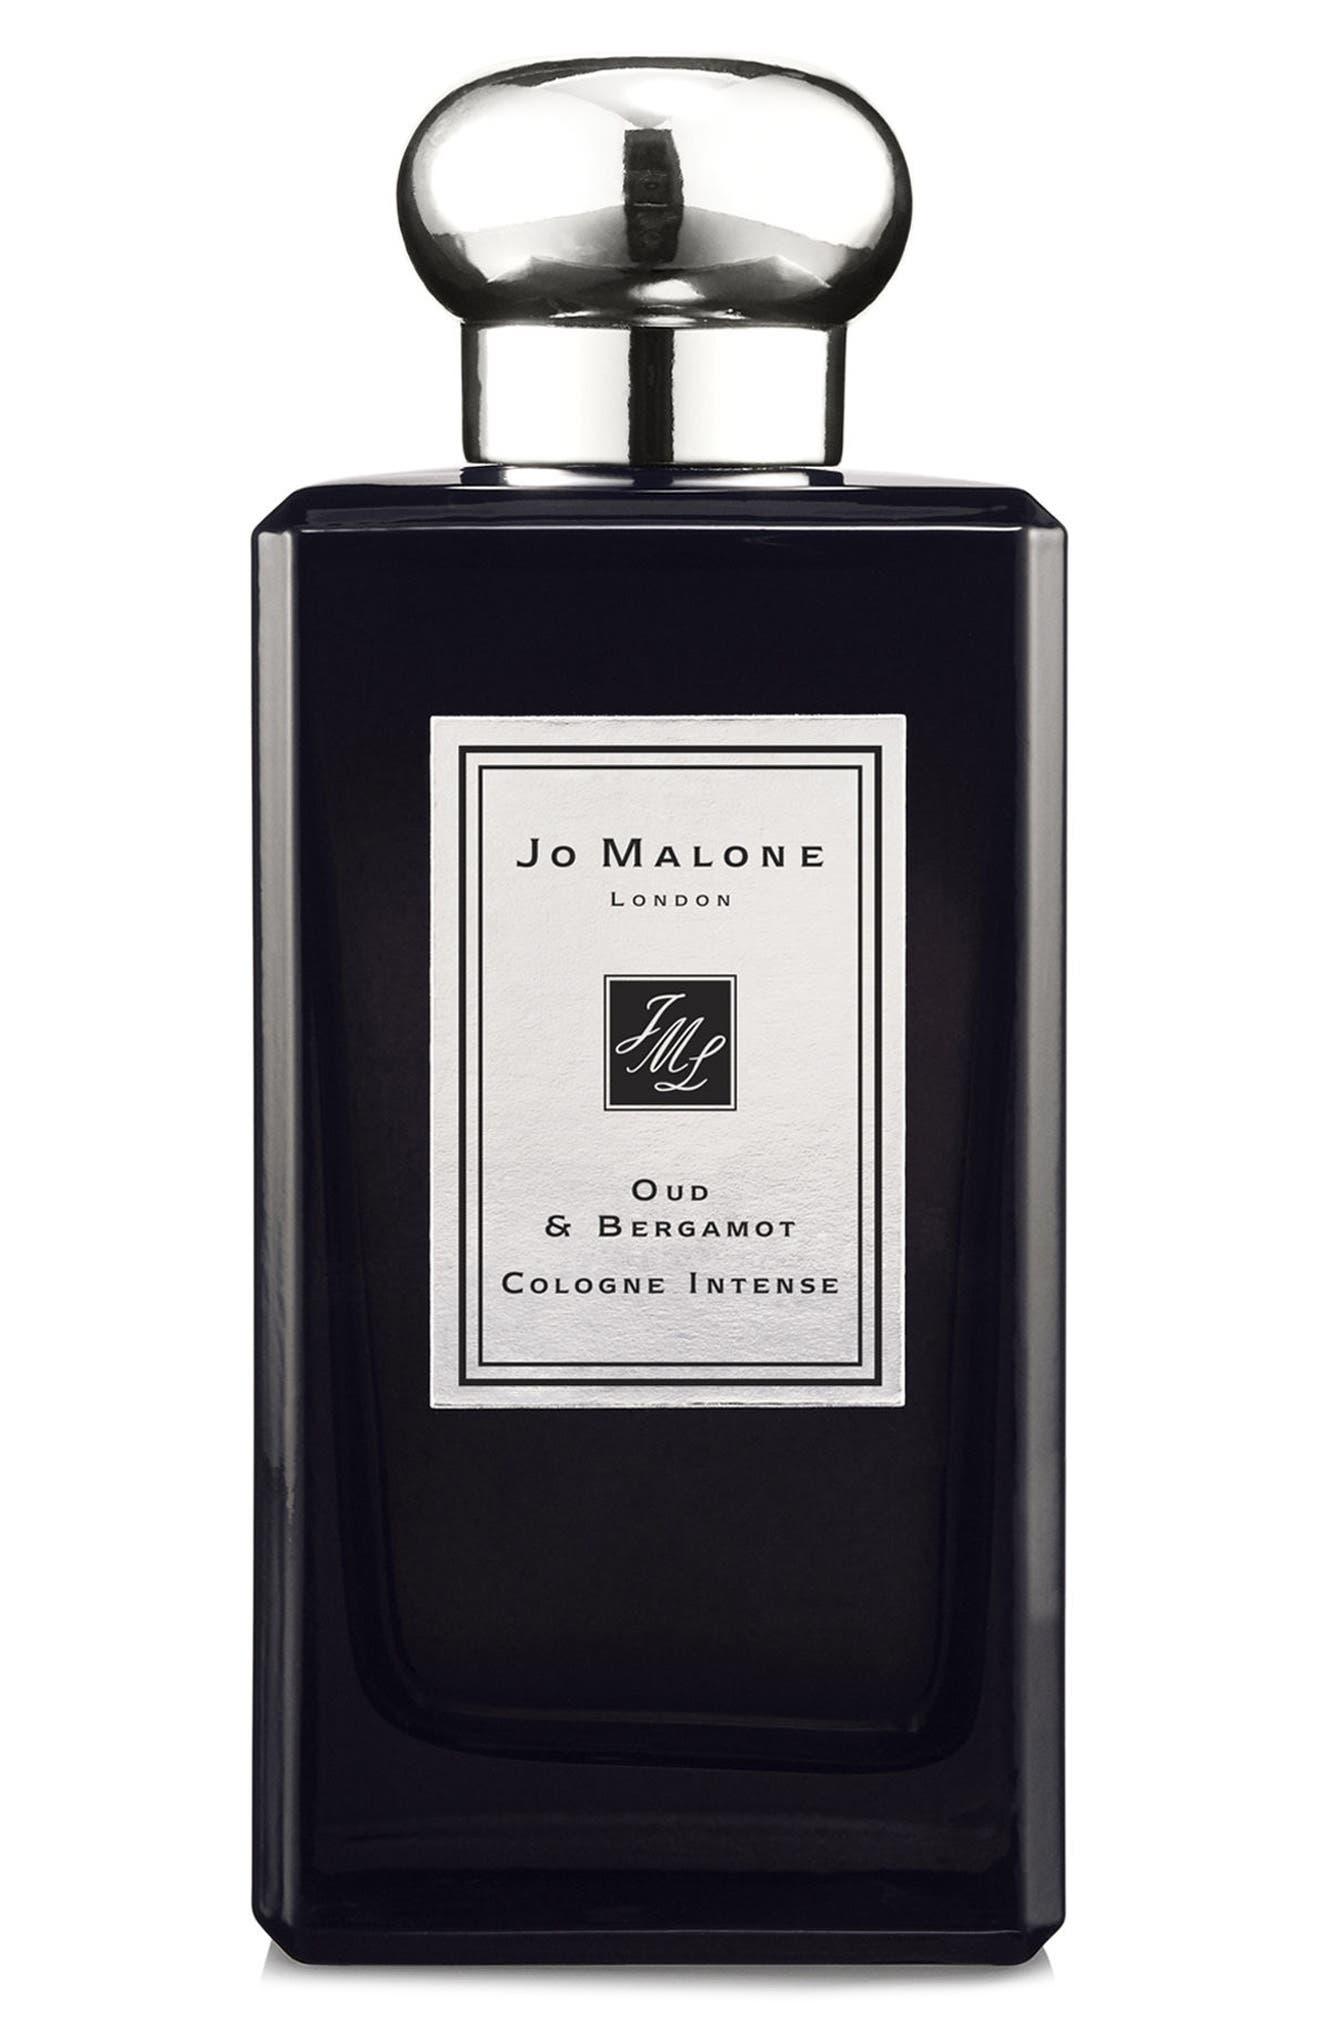 Jo Malone London™ 'Oud & Bergamot' Cologne Intense